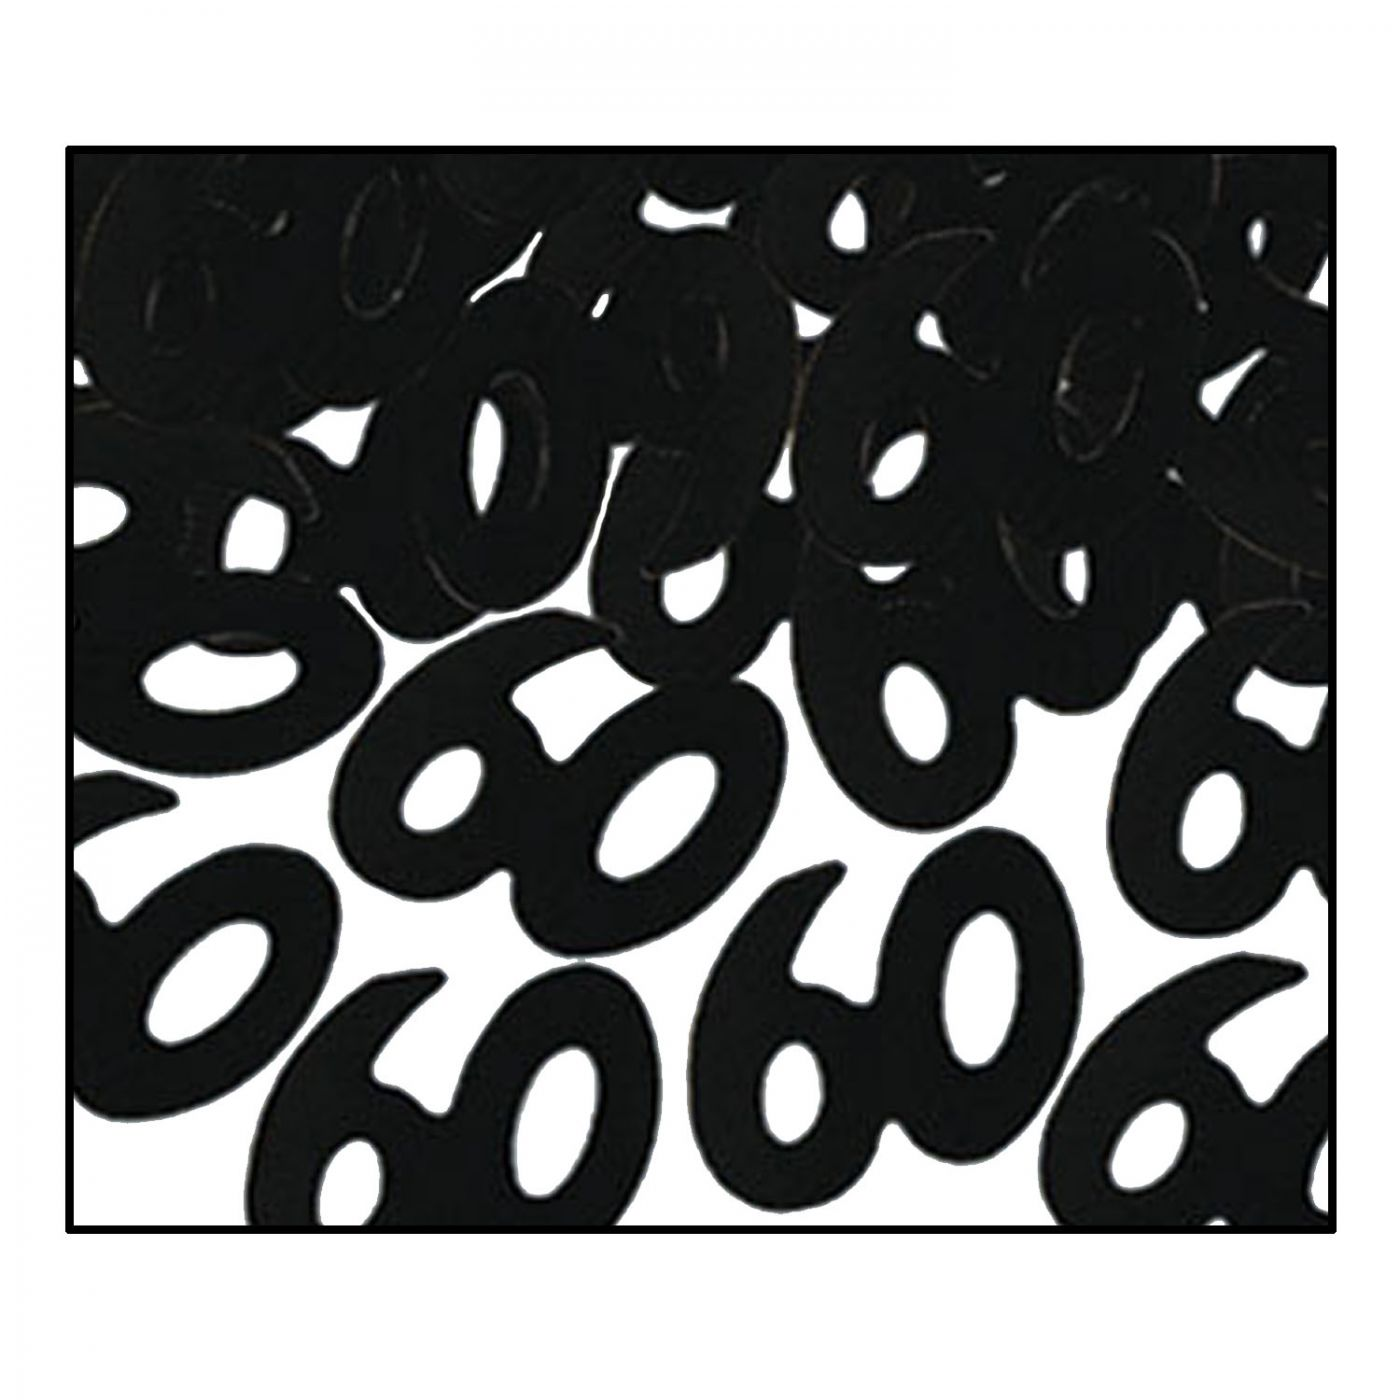 Fanci-Fetti  60  Silhouettes image